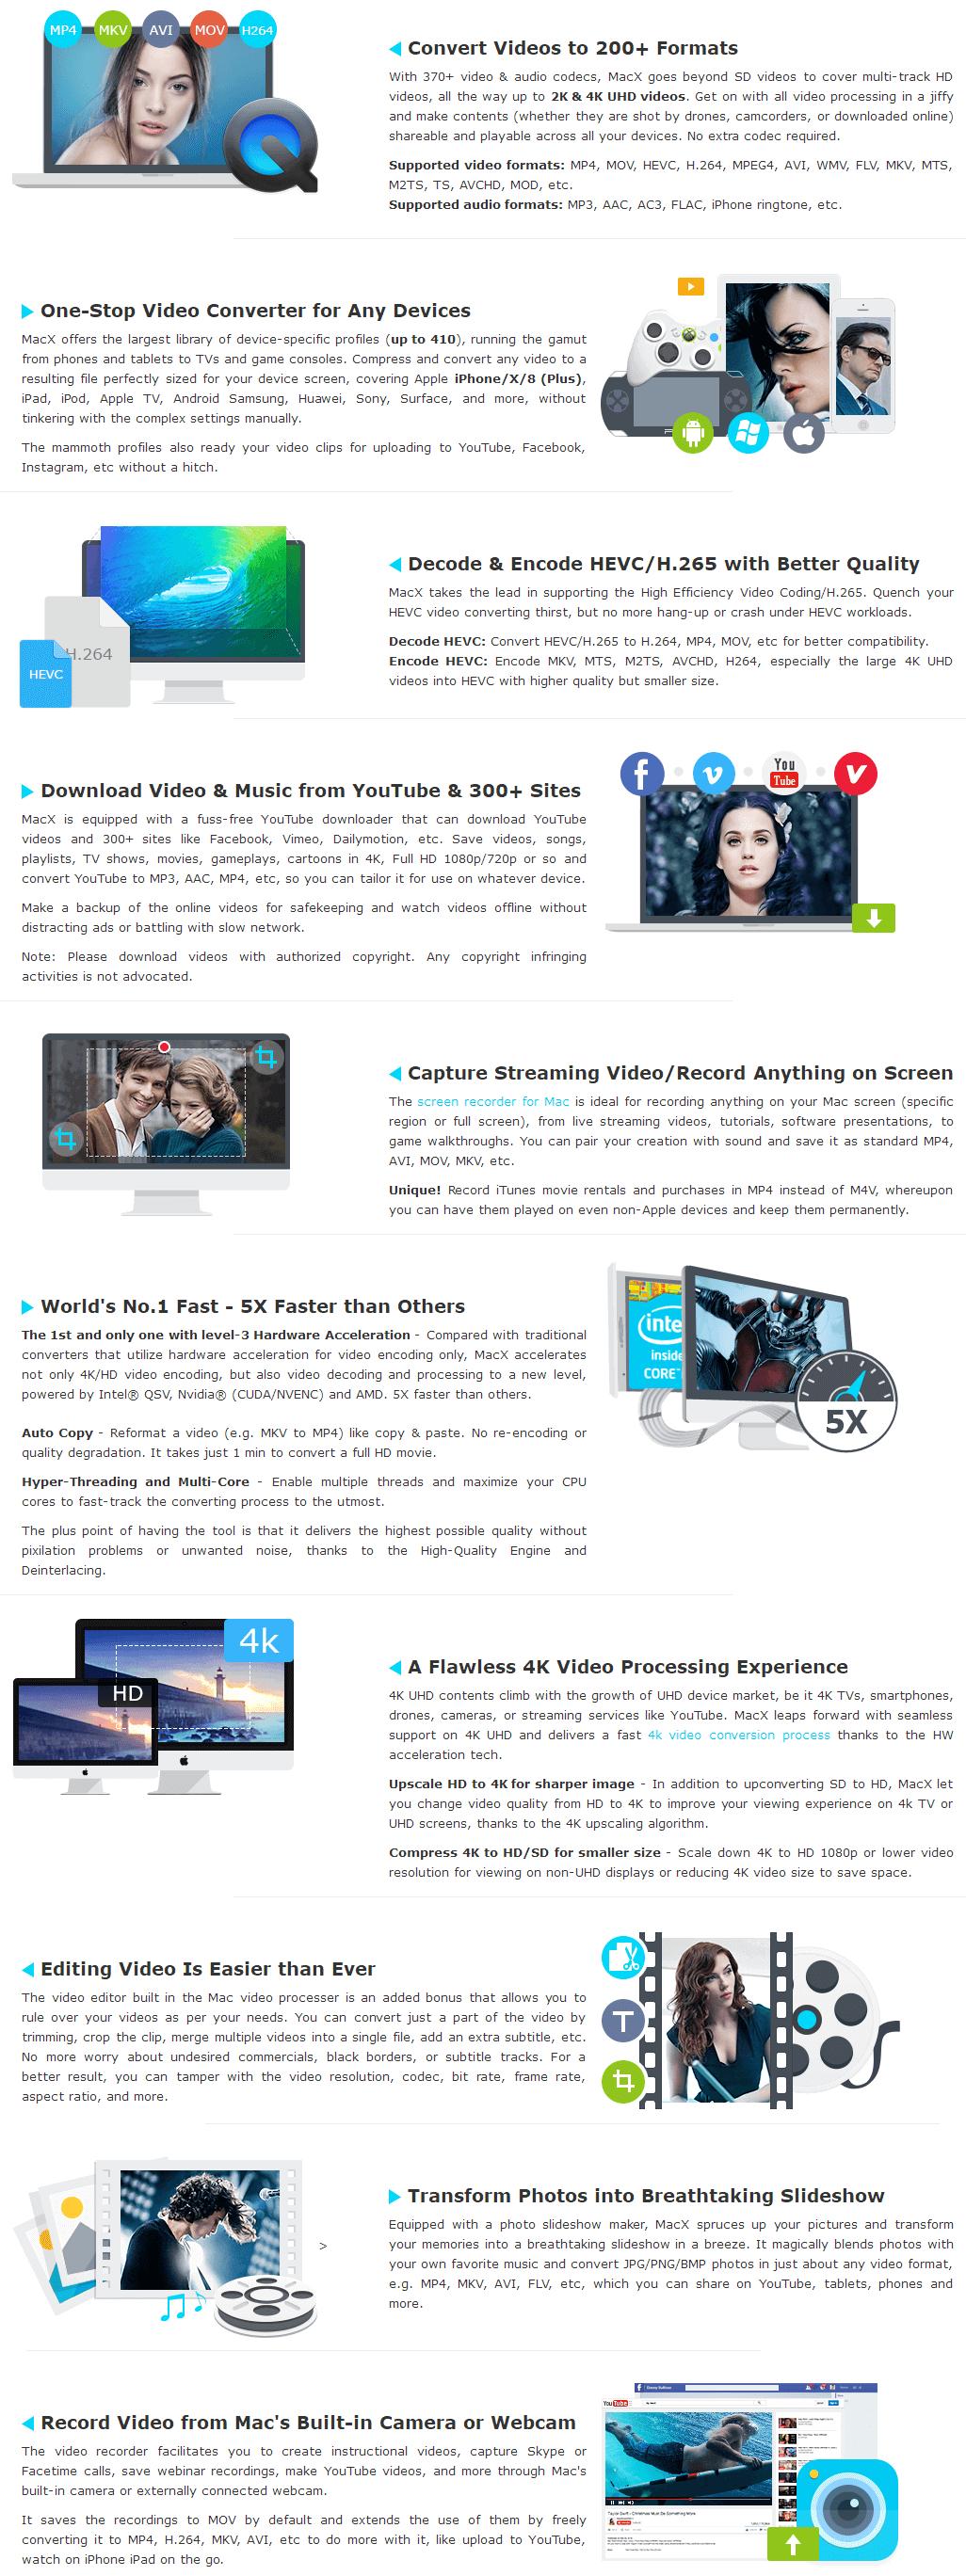 MacX Video Converter Pro 50% Discount